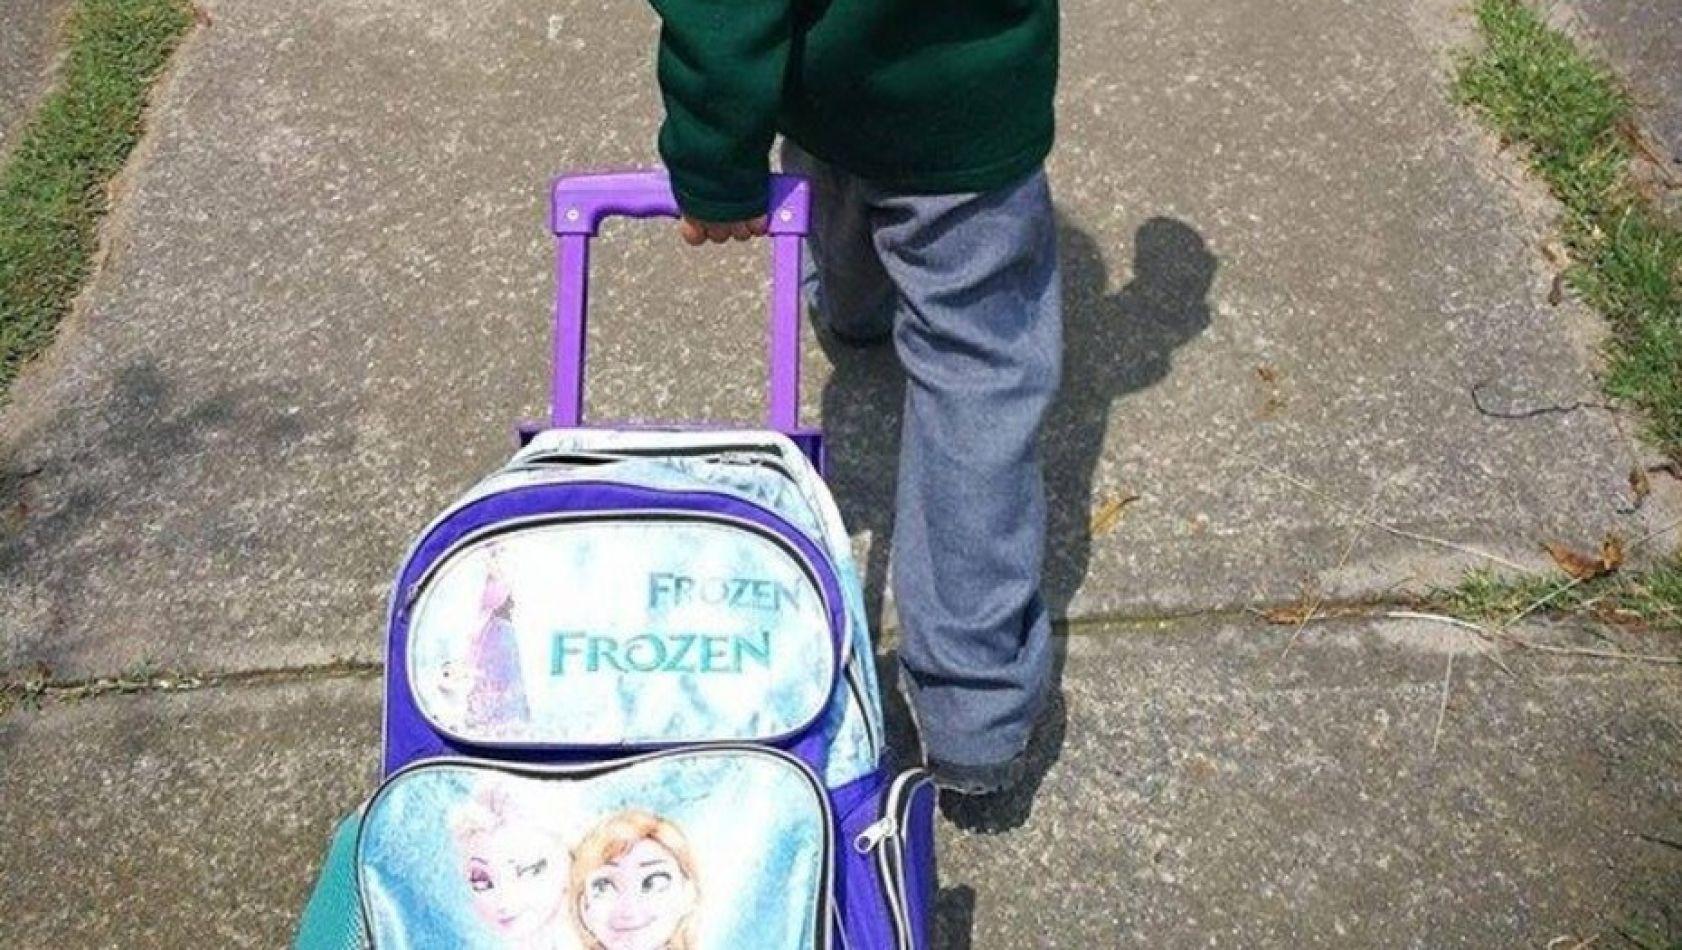 Niño con mochila de Frozen.